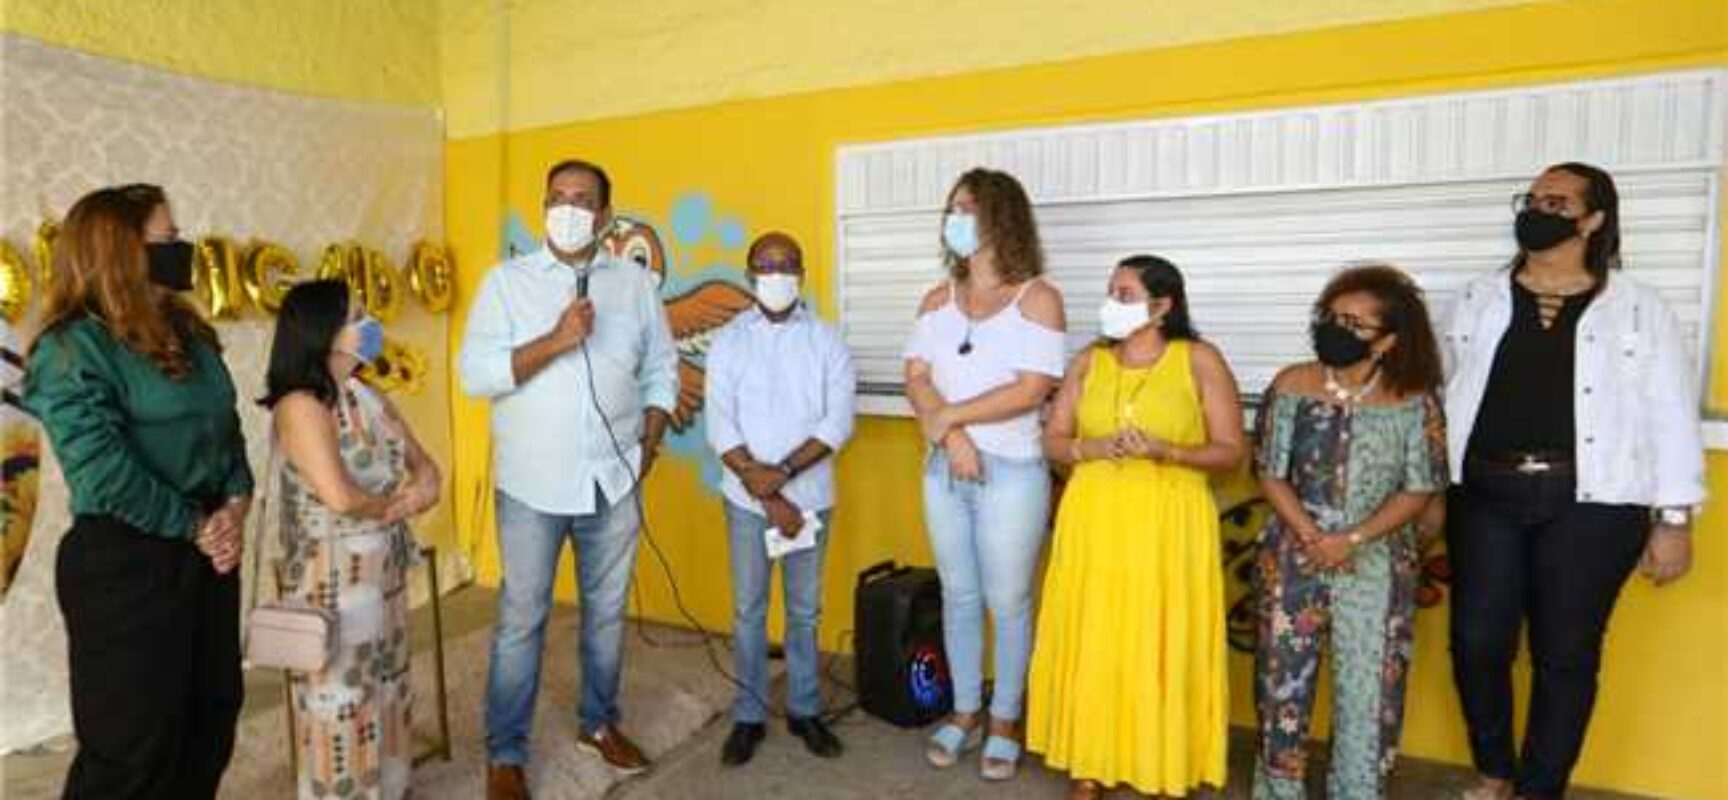 Prefeito Mário Alexandre entrega Escola Paulo Freire, do Teotônio Vilela, totalmente reformada para